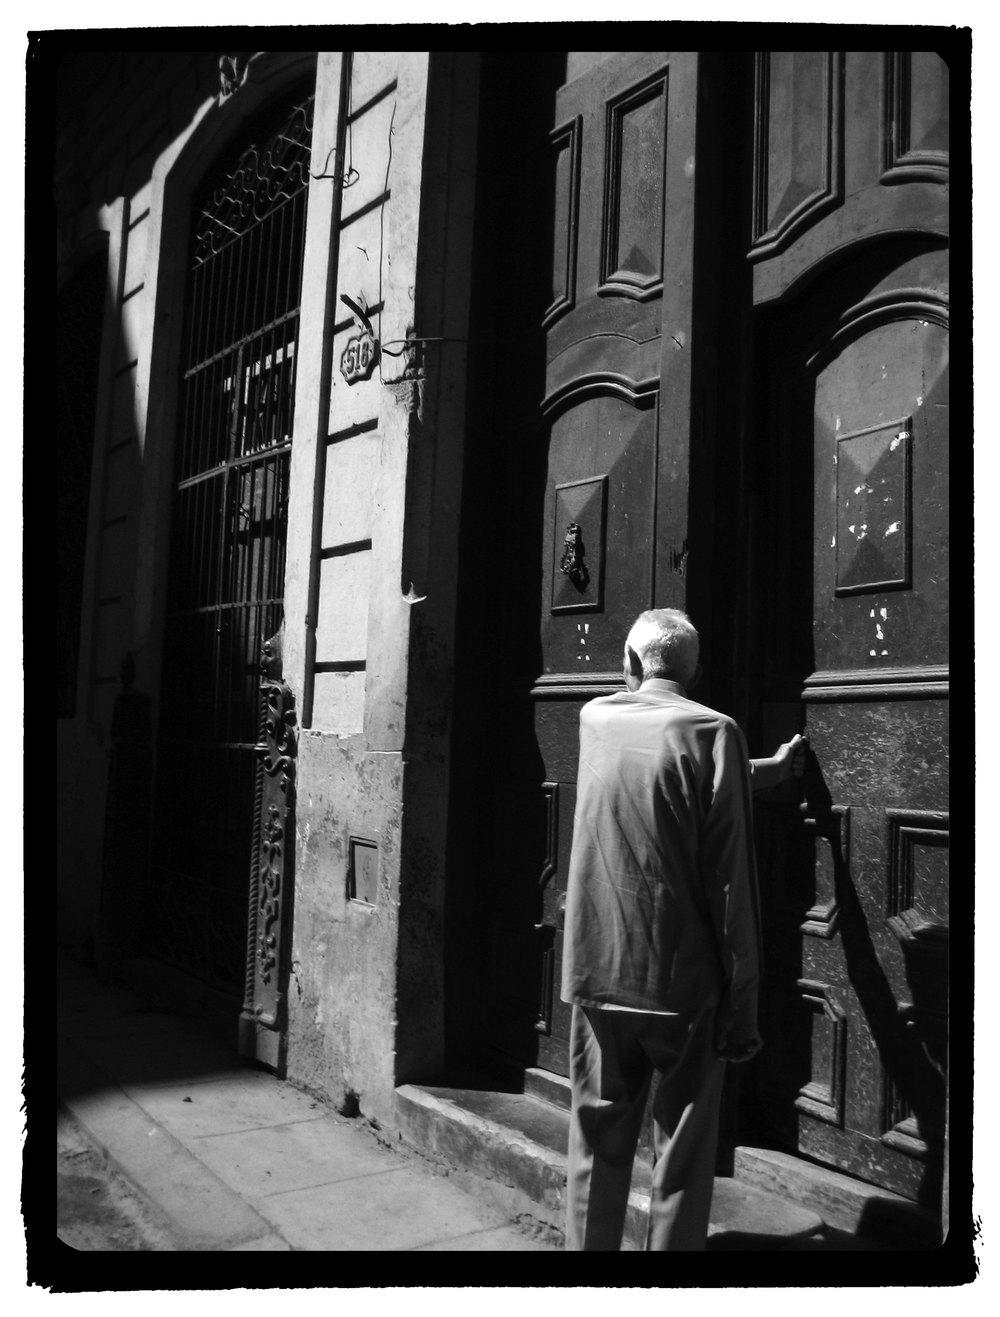 viejito-puerta-2-WEB.jpg